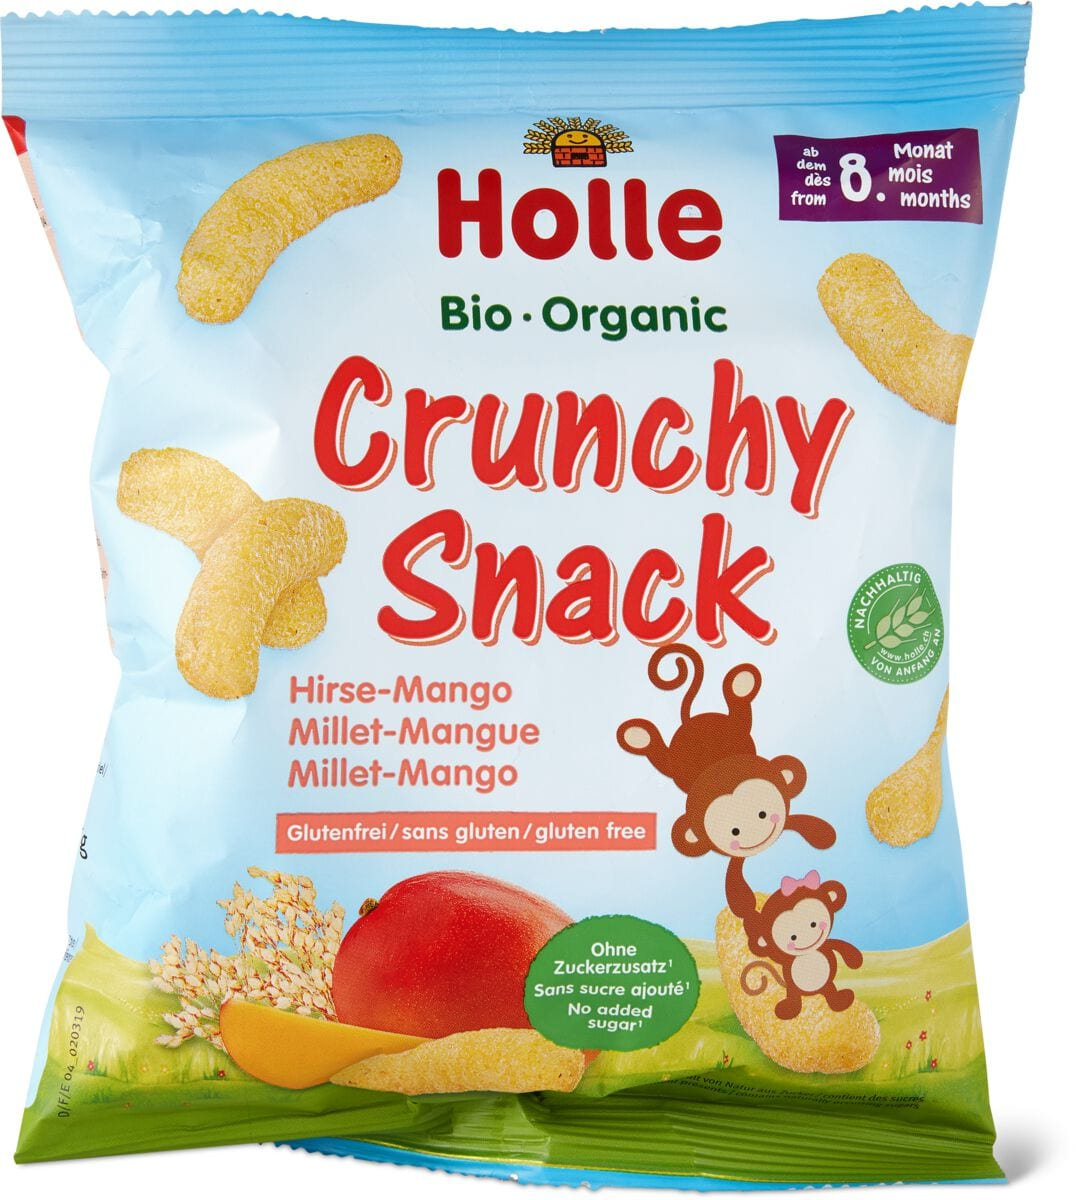 Crunchy Snack M & H